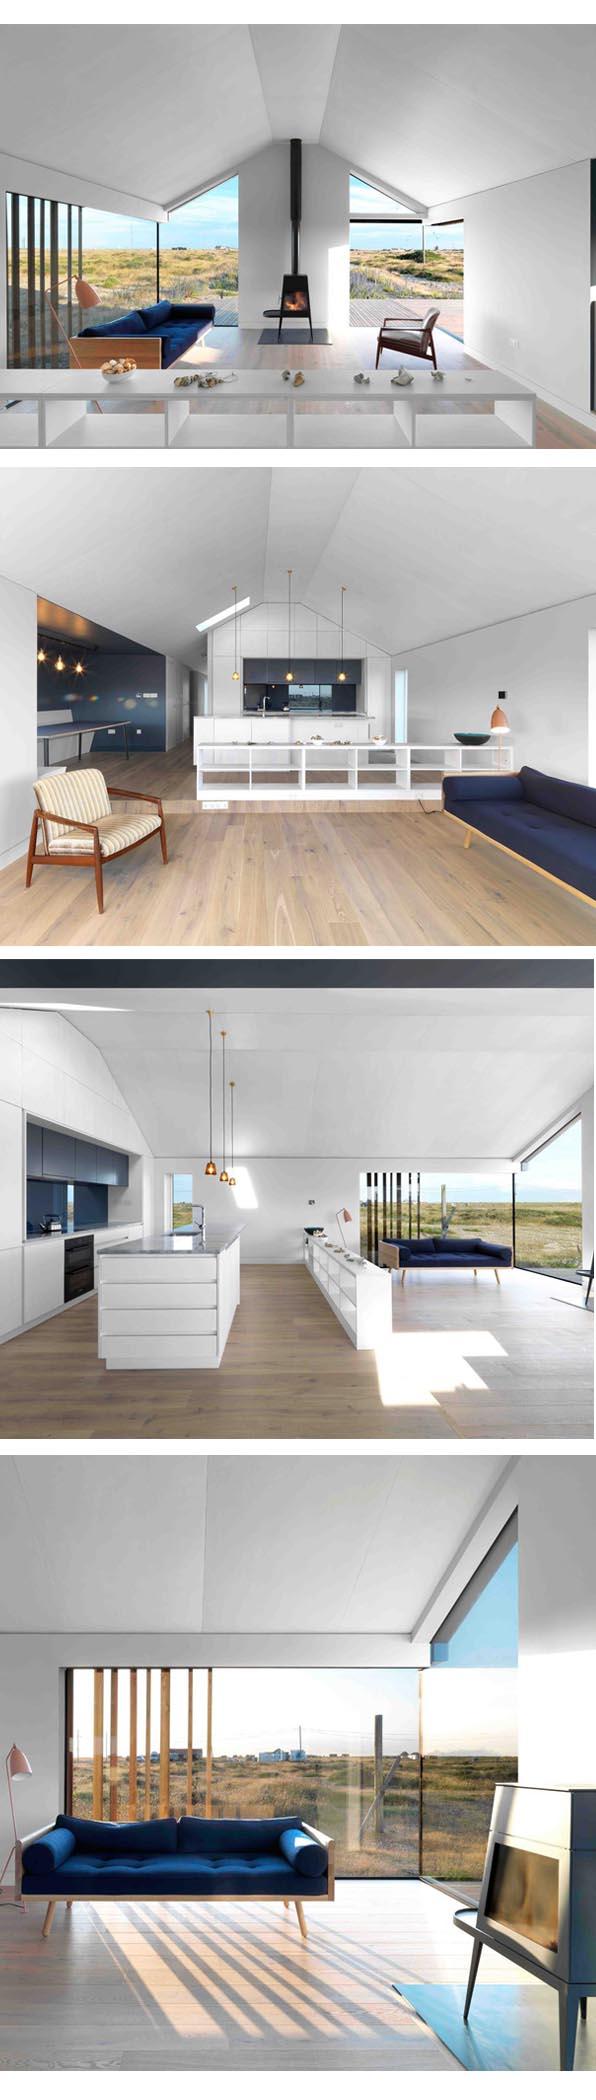 POBBLE HOUSE GUY HOLLAWAY ARCHITECTS EN MODUS-VIVENDI arquitectura desértica arquitectos modular prefabricada